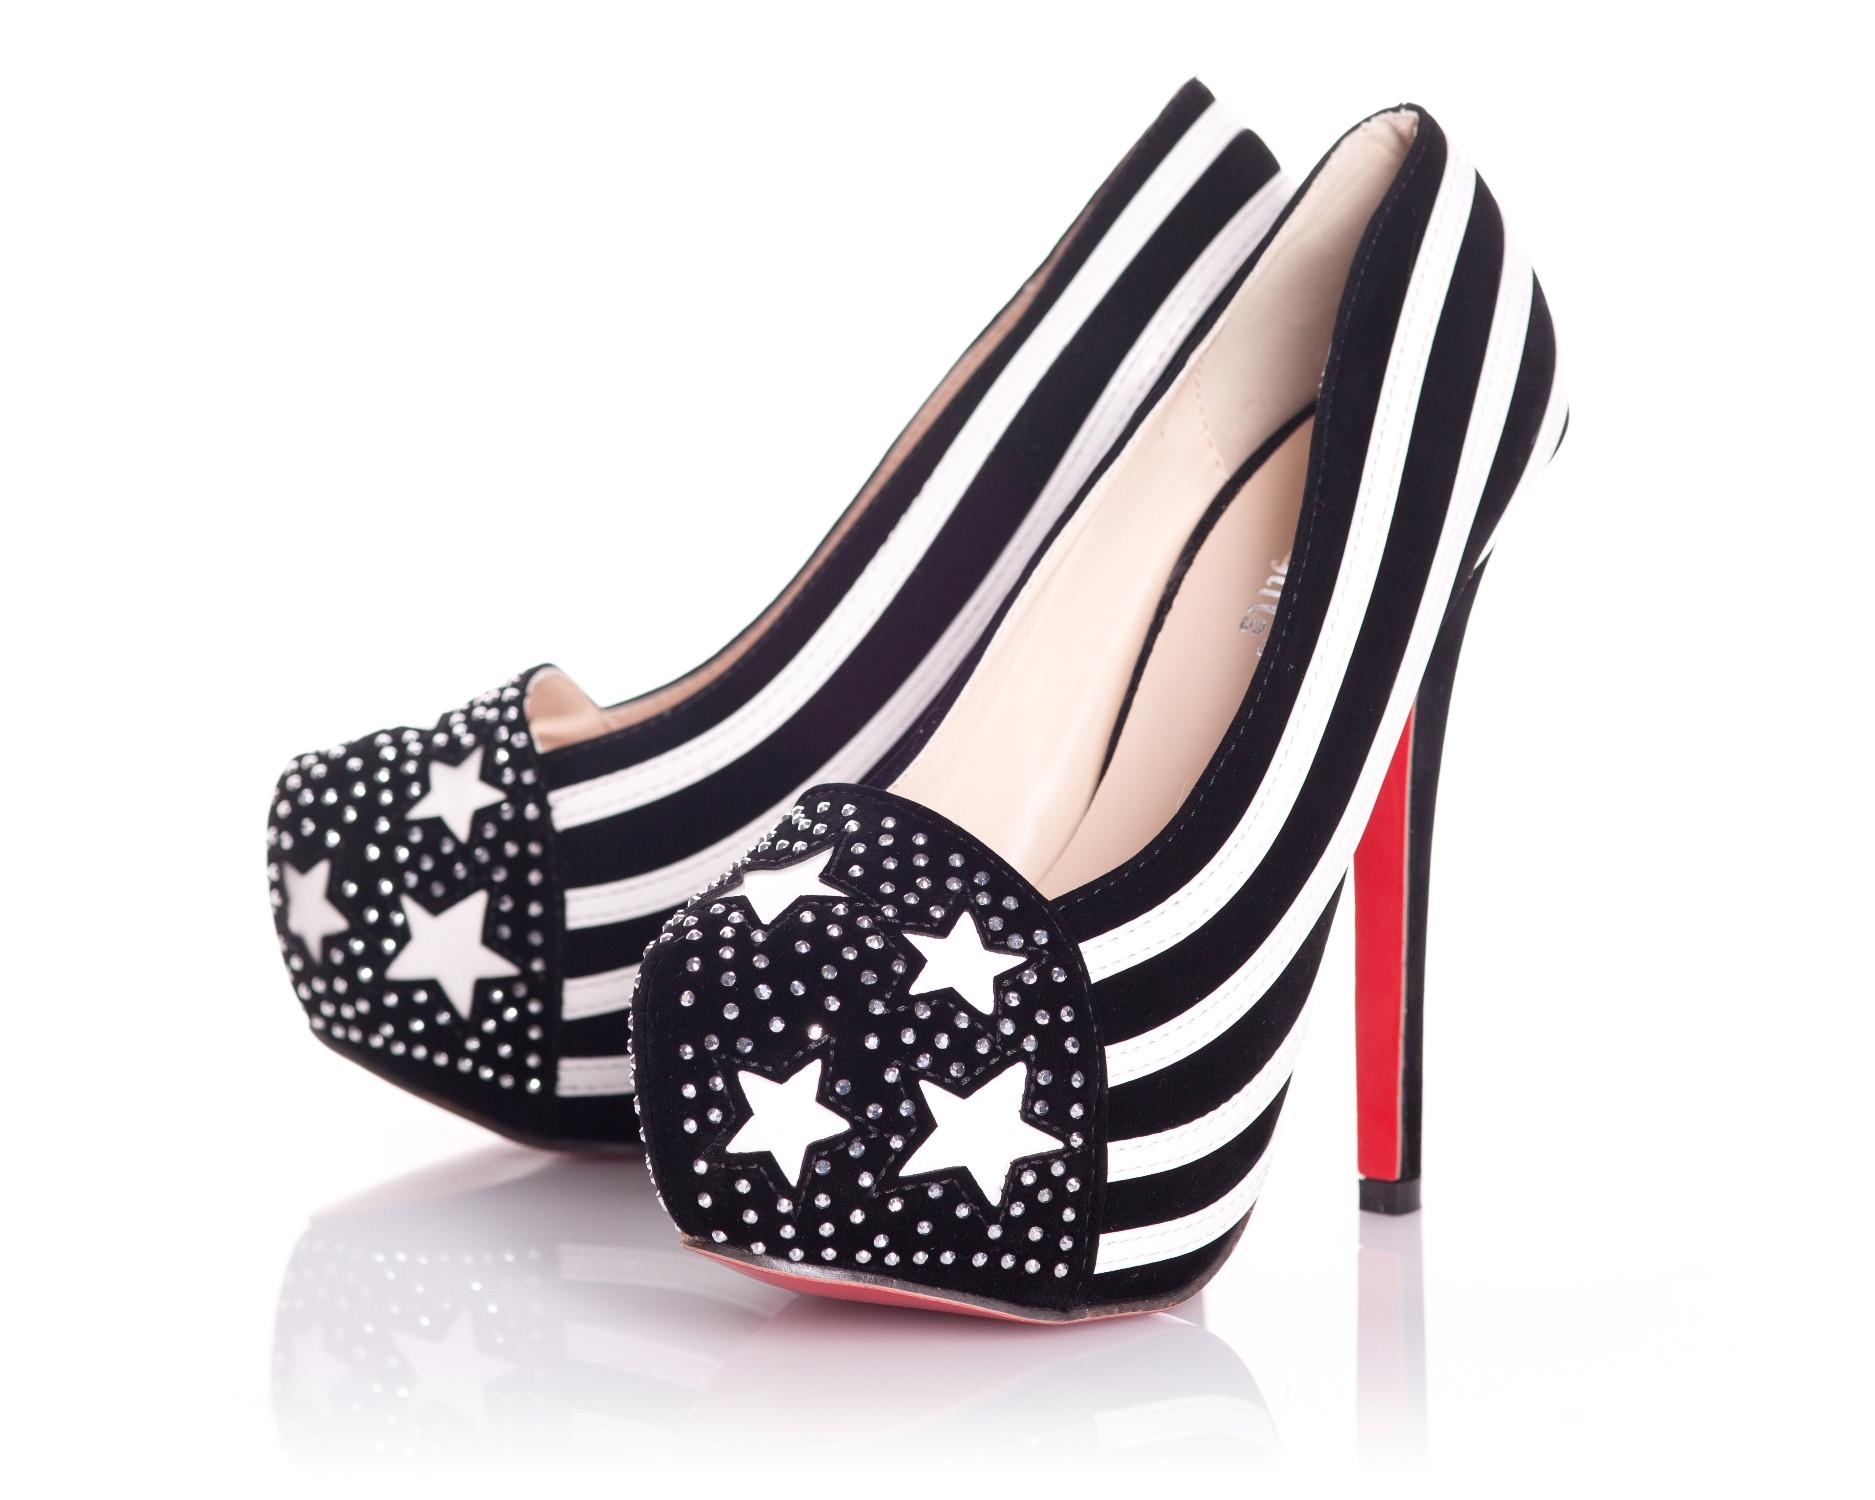 Stars & Stripes Shoes In Black & White